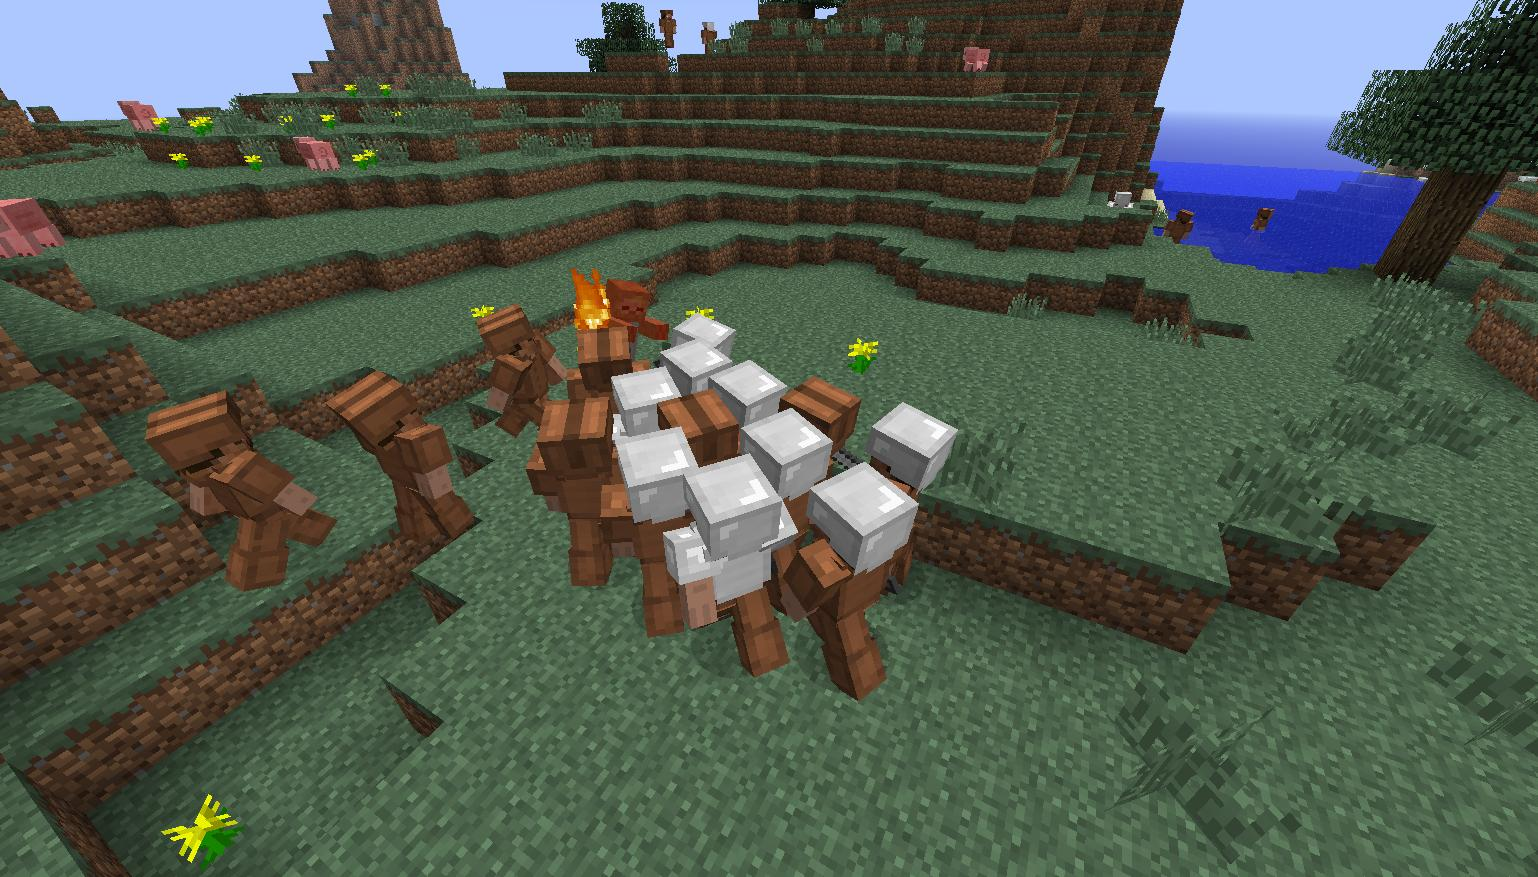 http://planetaminecraft.com/wp-content/uploads/2013/03/41d28__Defensive-Villagers-Mod-3.jpg